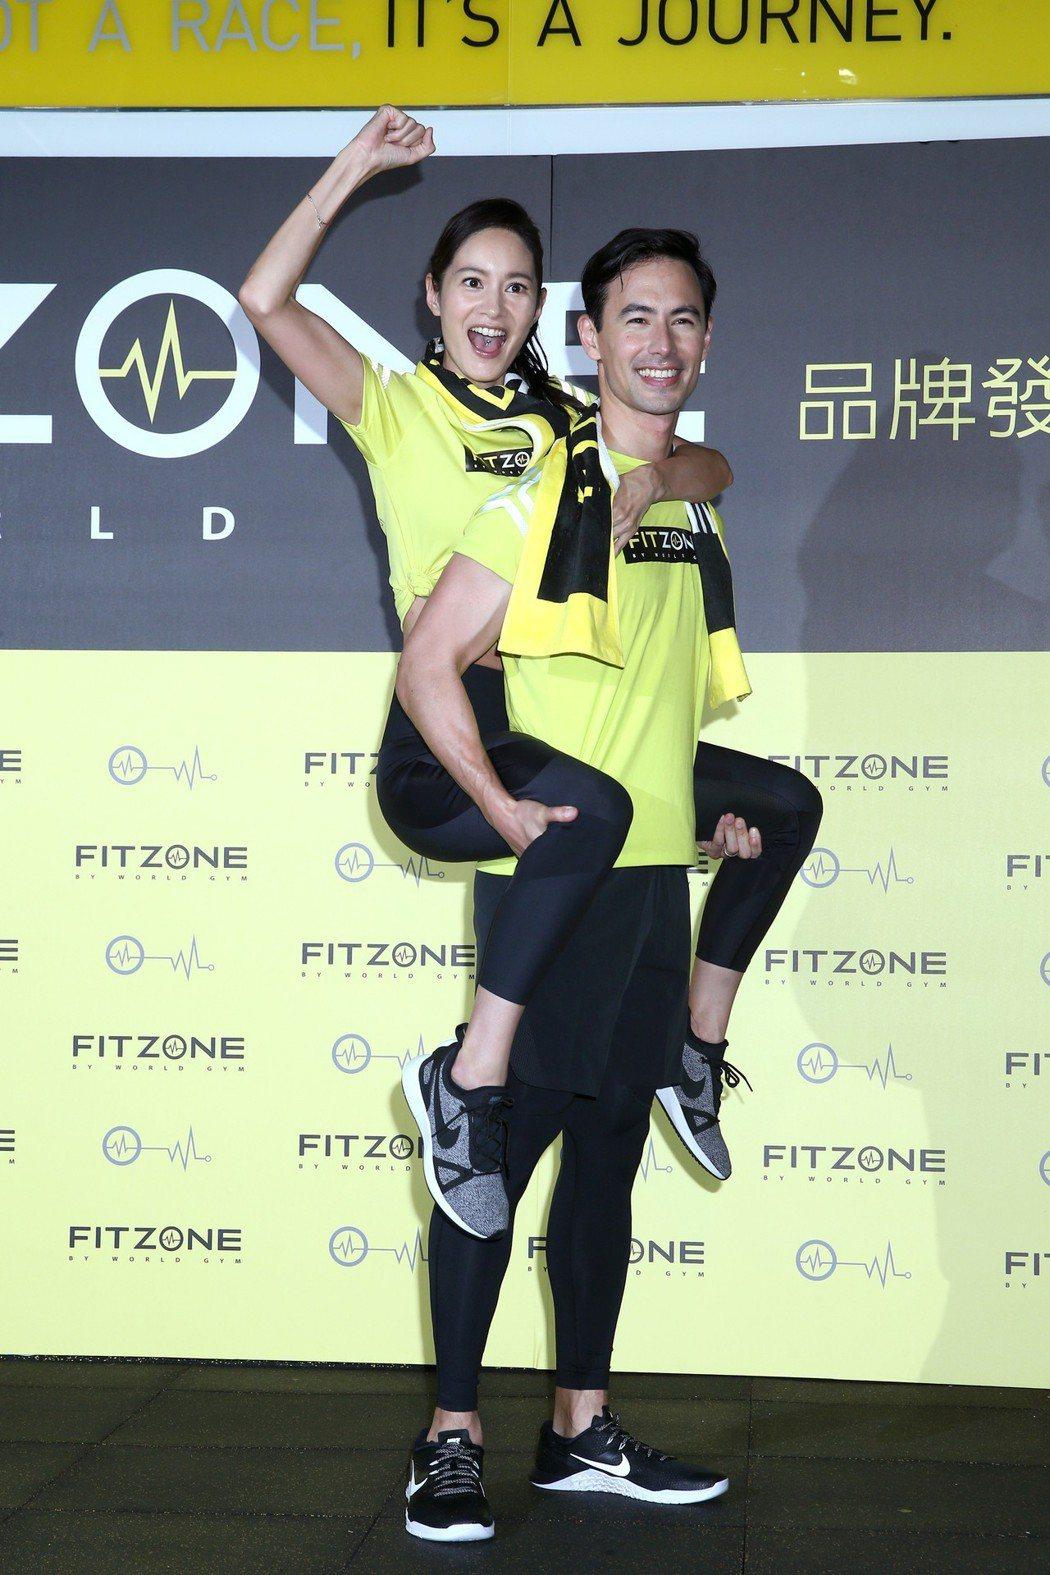 Janet(謝怡芬)(左)與老公George(右)昨天出席新健身品牌發表,一起體...